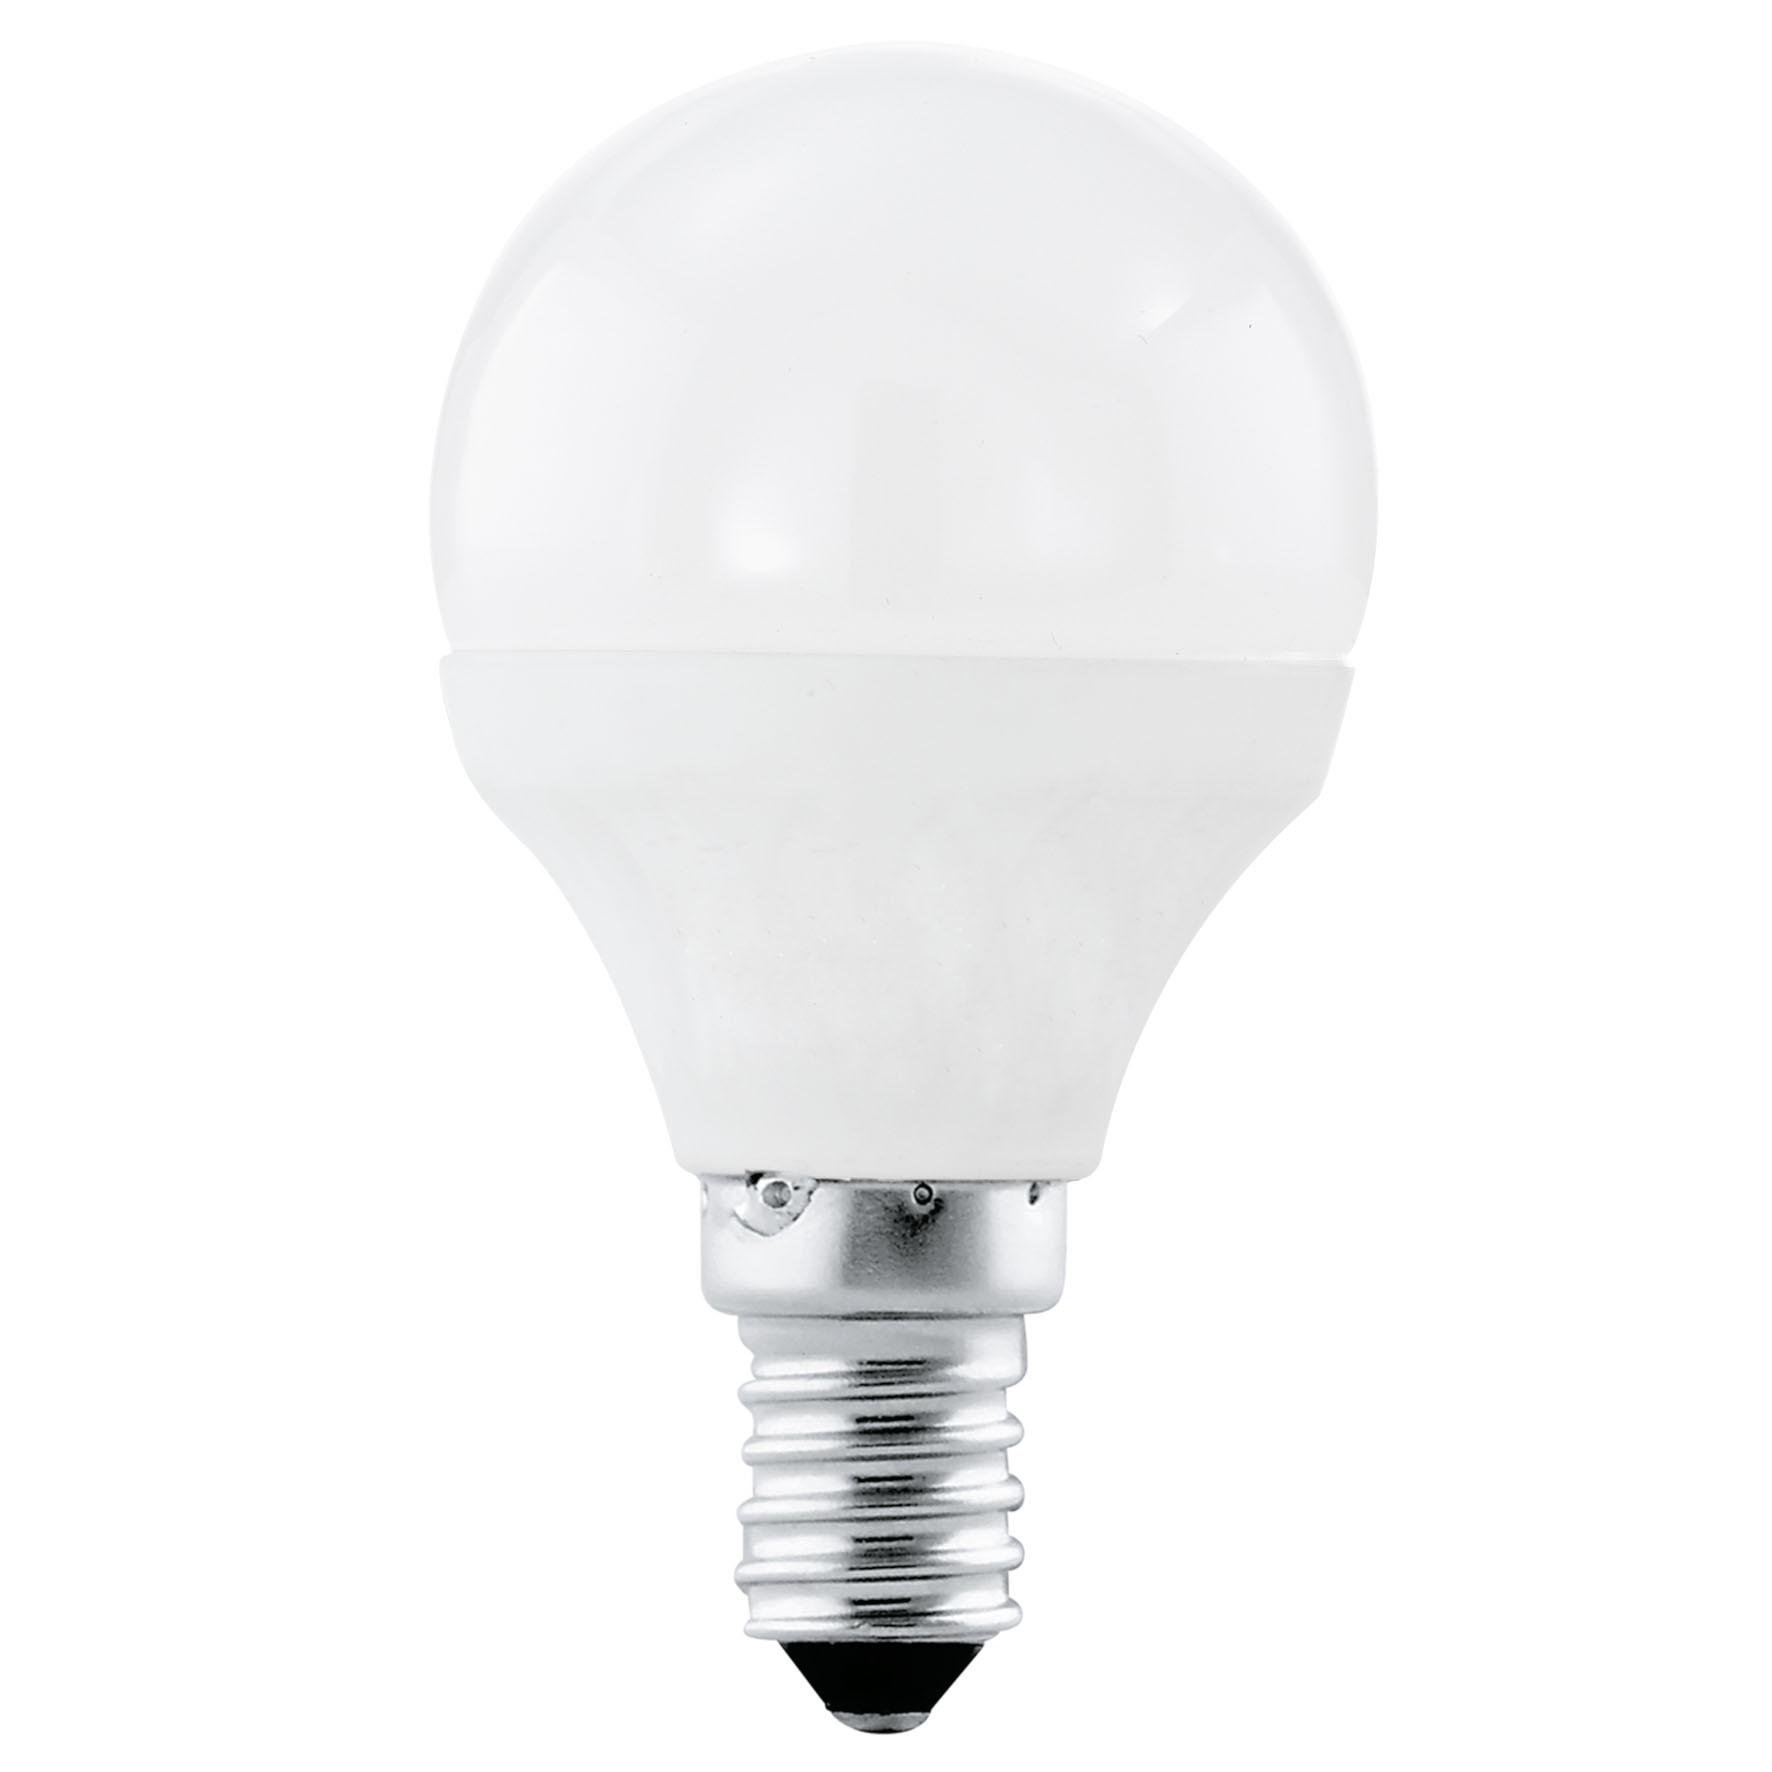 10698---0 Wunderbar Led Lampen E14 Dekorationen